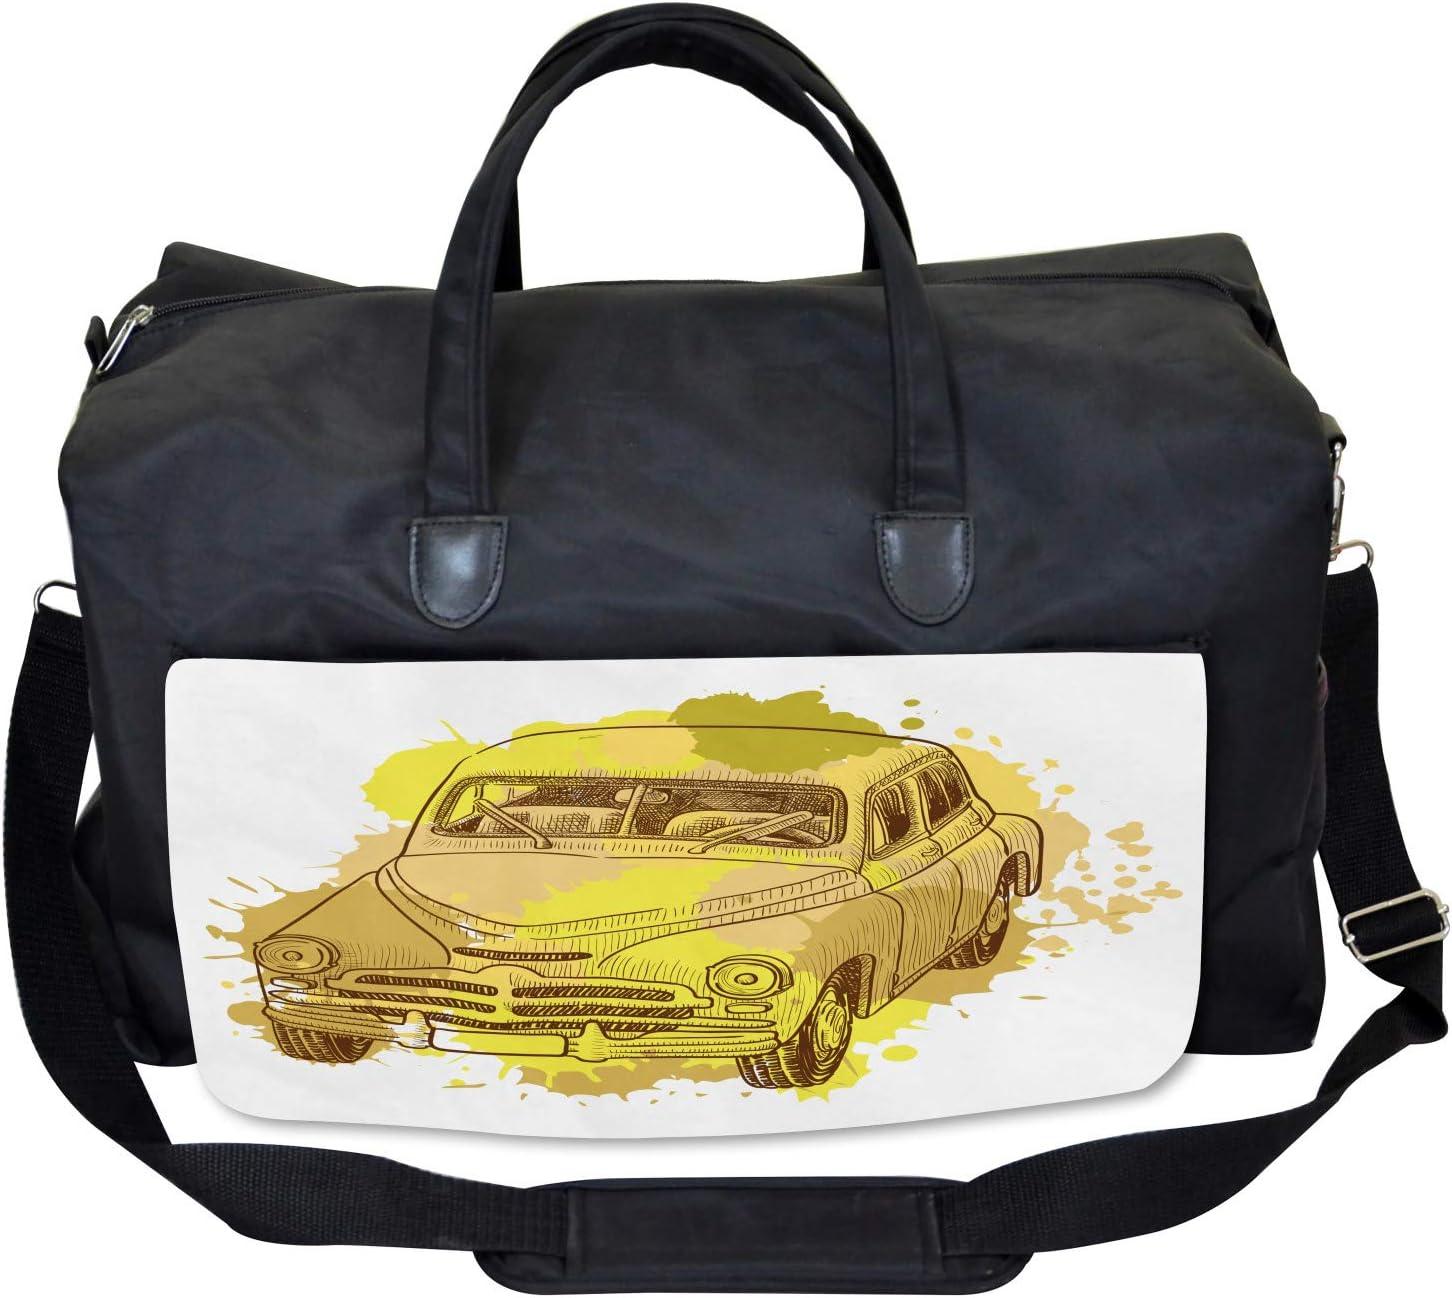 Large Weekender Carry-on Ambesonne Gym Bag Retro Car Splash Artsy